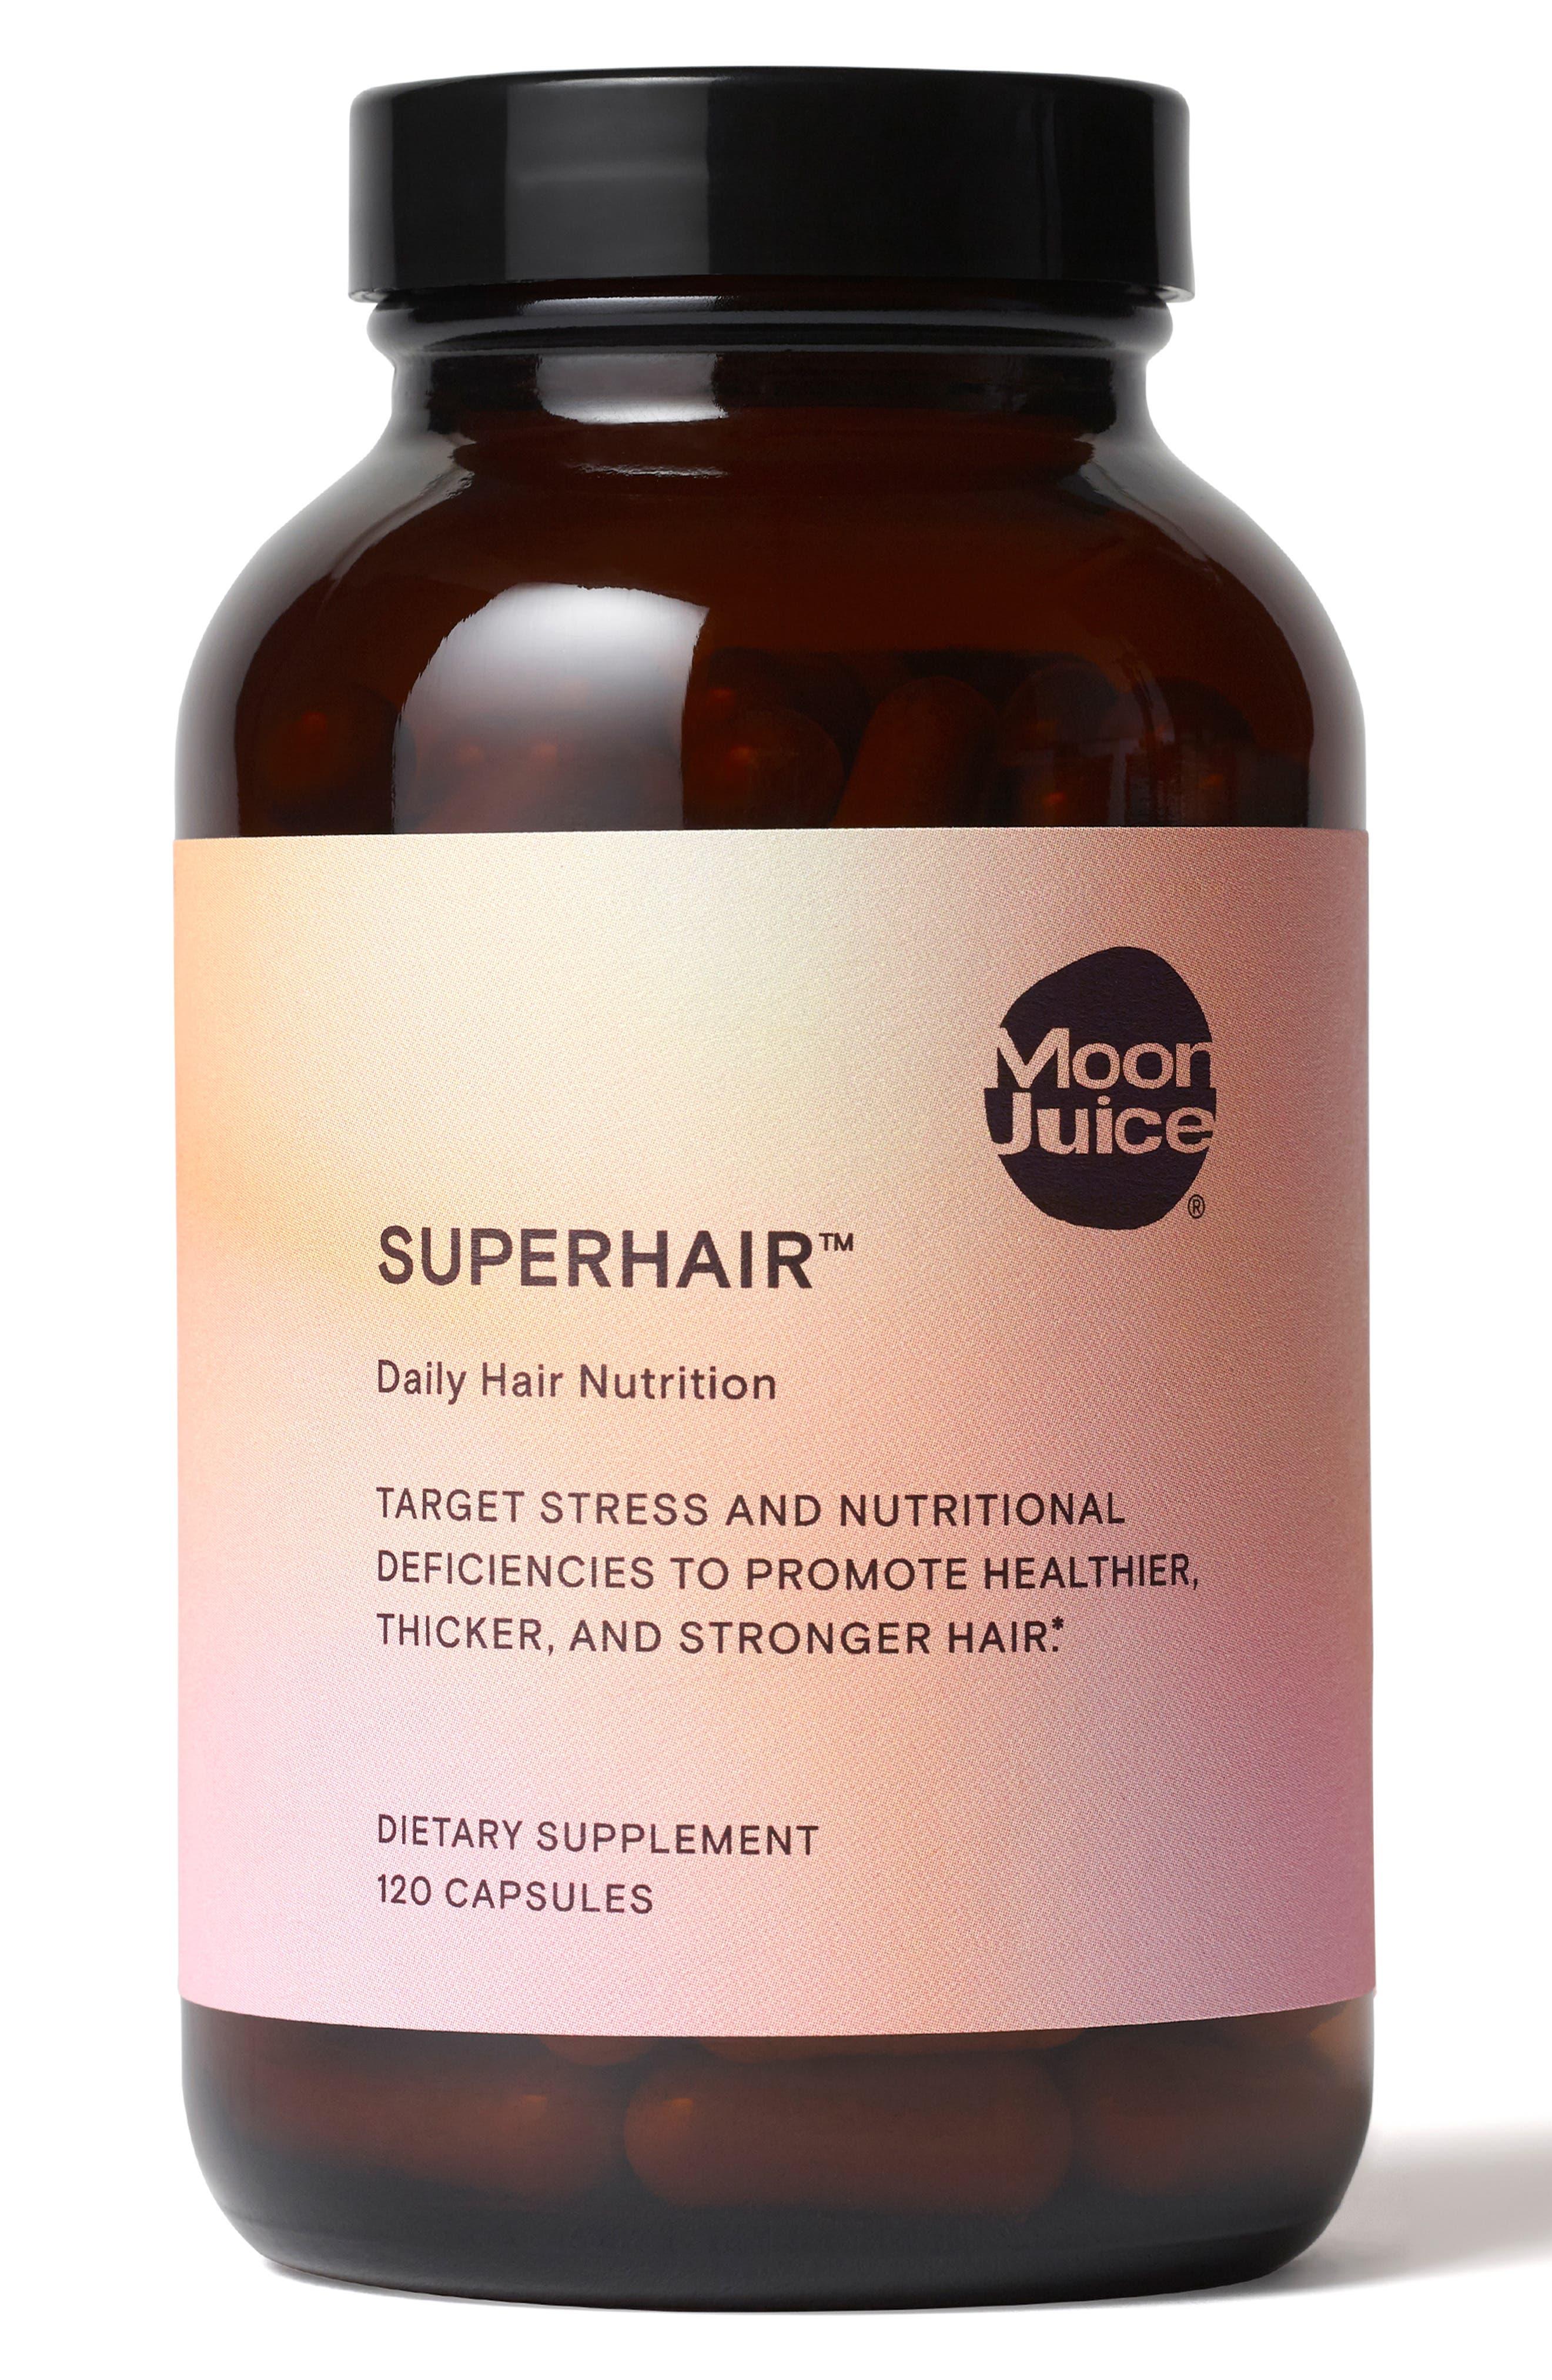 Image of Moon Juice SuperHair Supplements